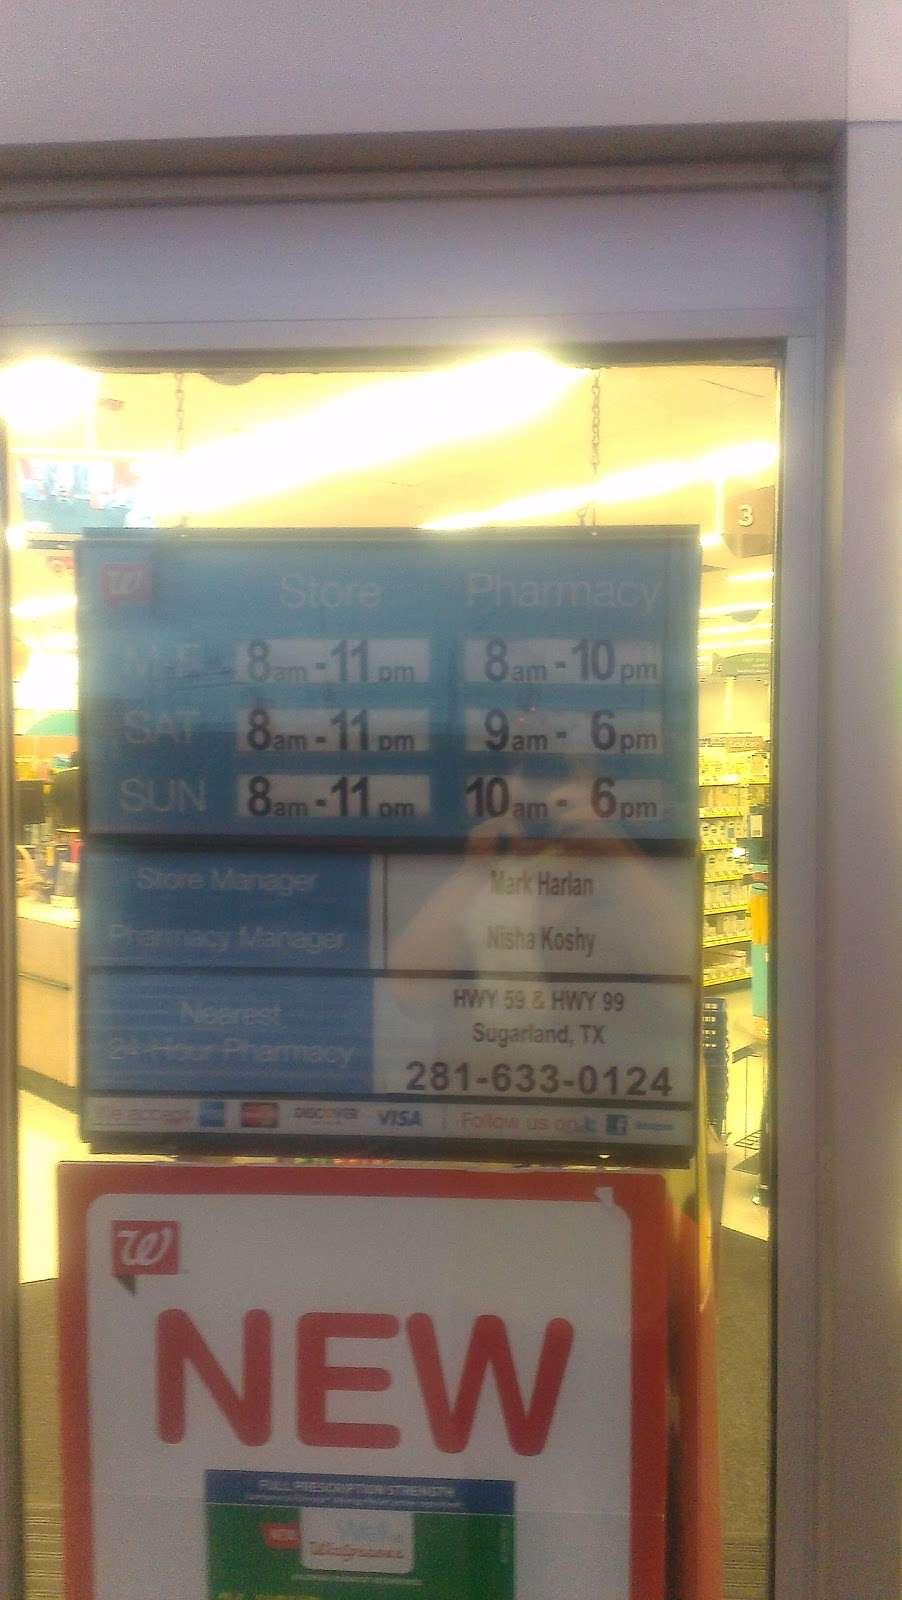 Thuylieu Huynh, PharmD - pharmacy  | Photo 2 of 2 | Address: 3902 FM 762 Rd, Rosenberg, TX 77469, USA | Phone: (281) 232-2962